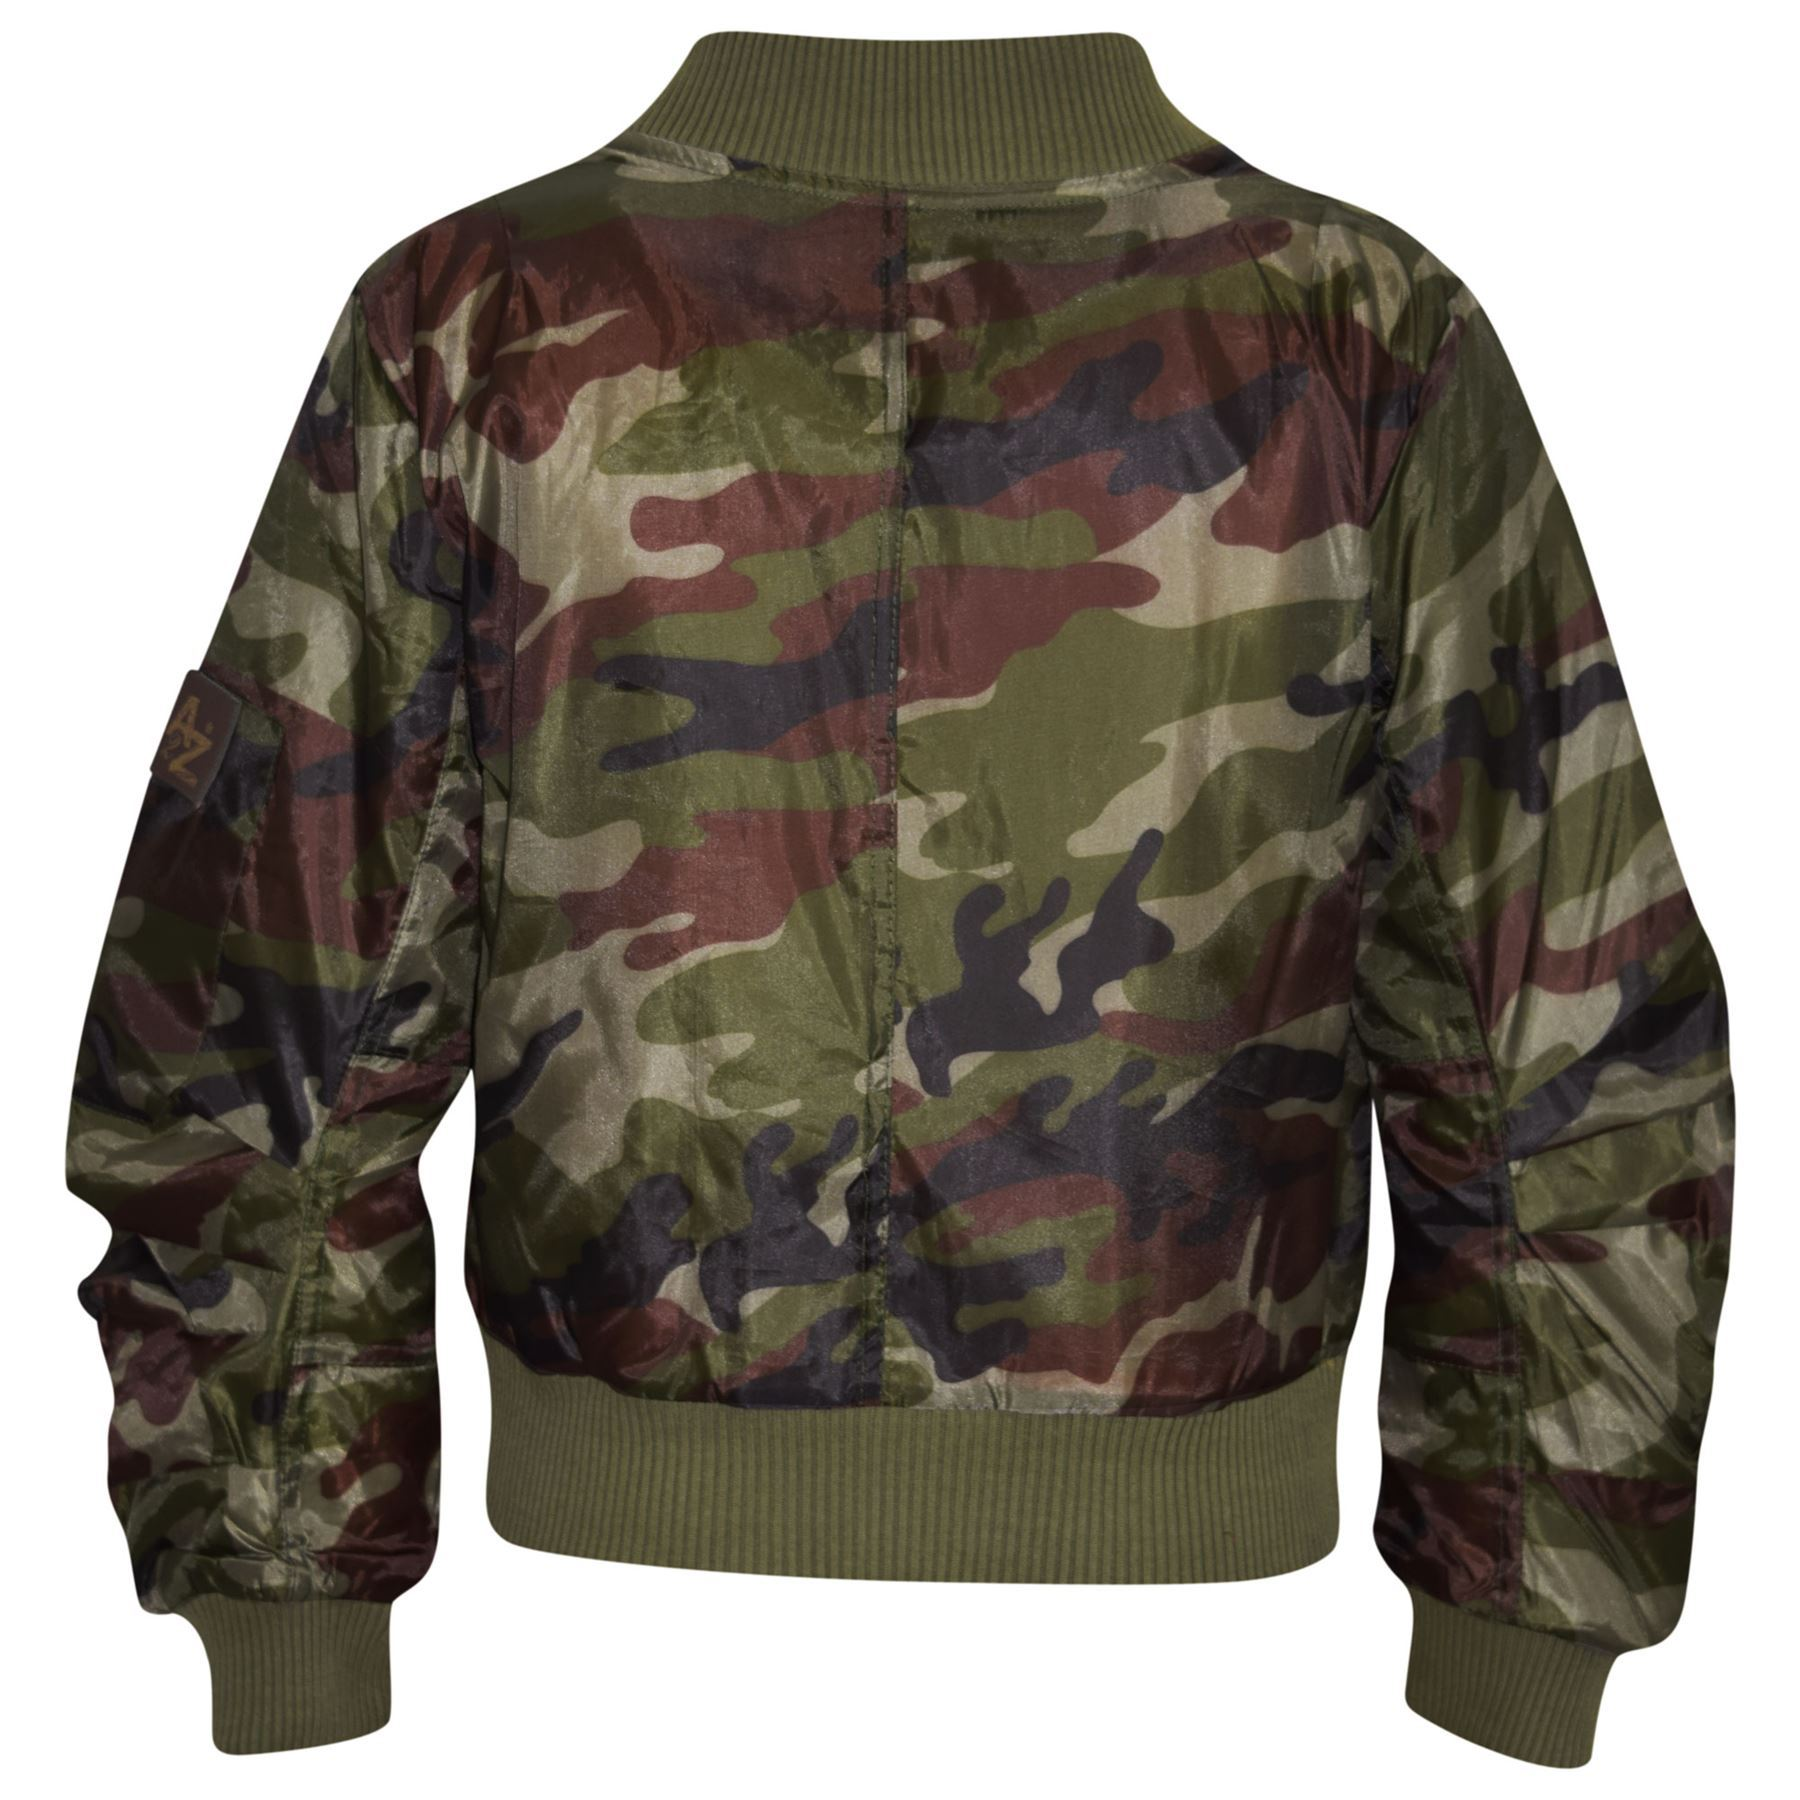 e4ce35f8e Kids Jacket Girls Boys Camouflage Bomber Padded Zip Up Biker Jacktes ...